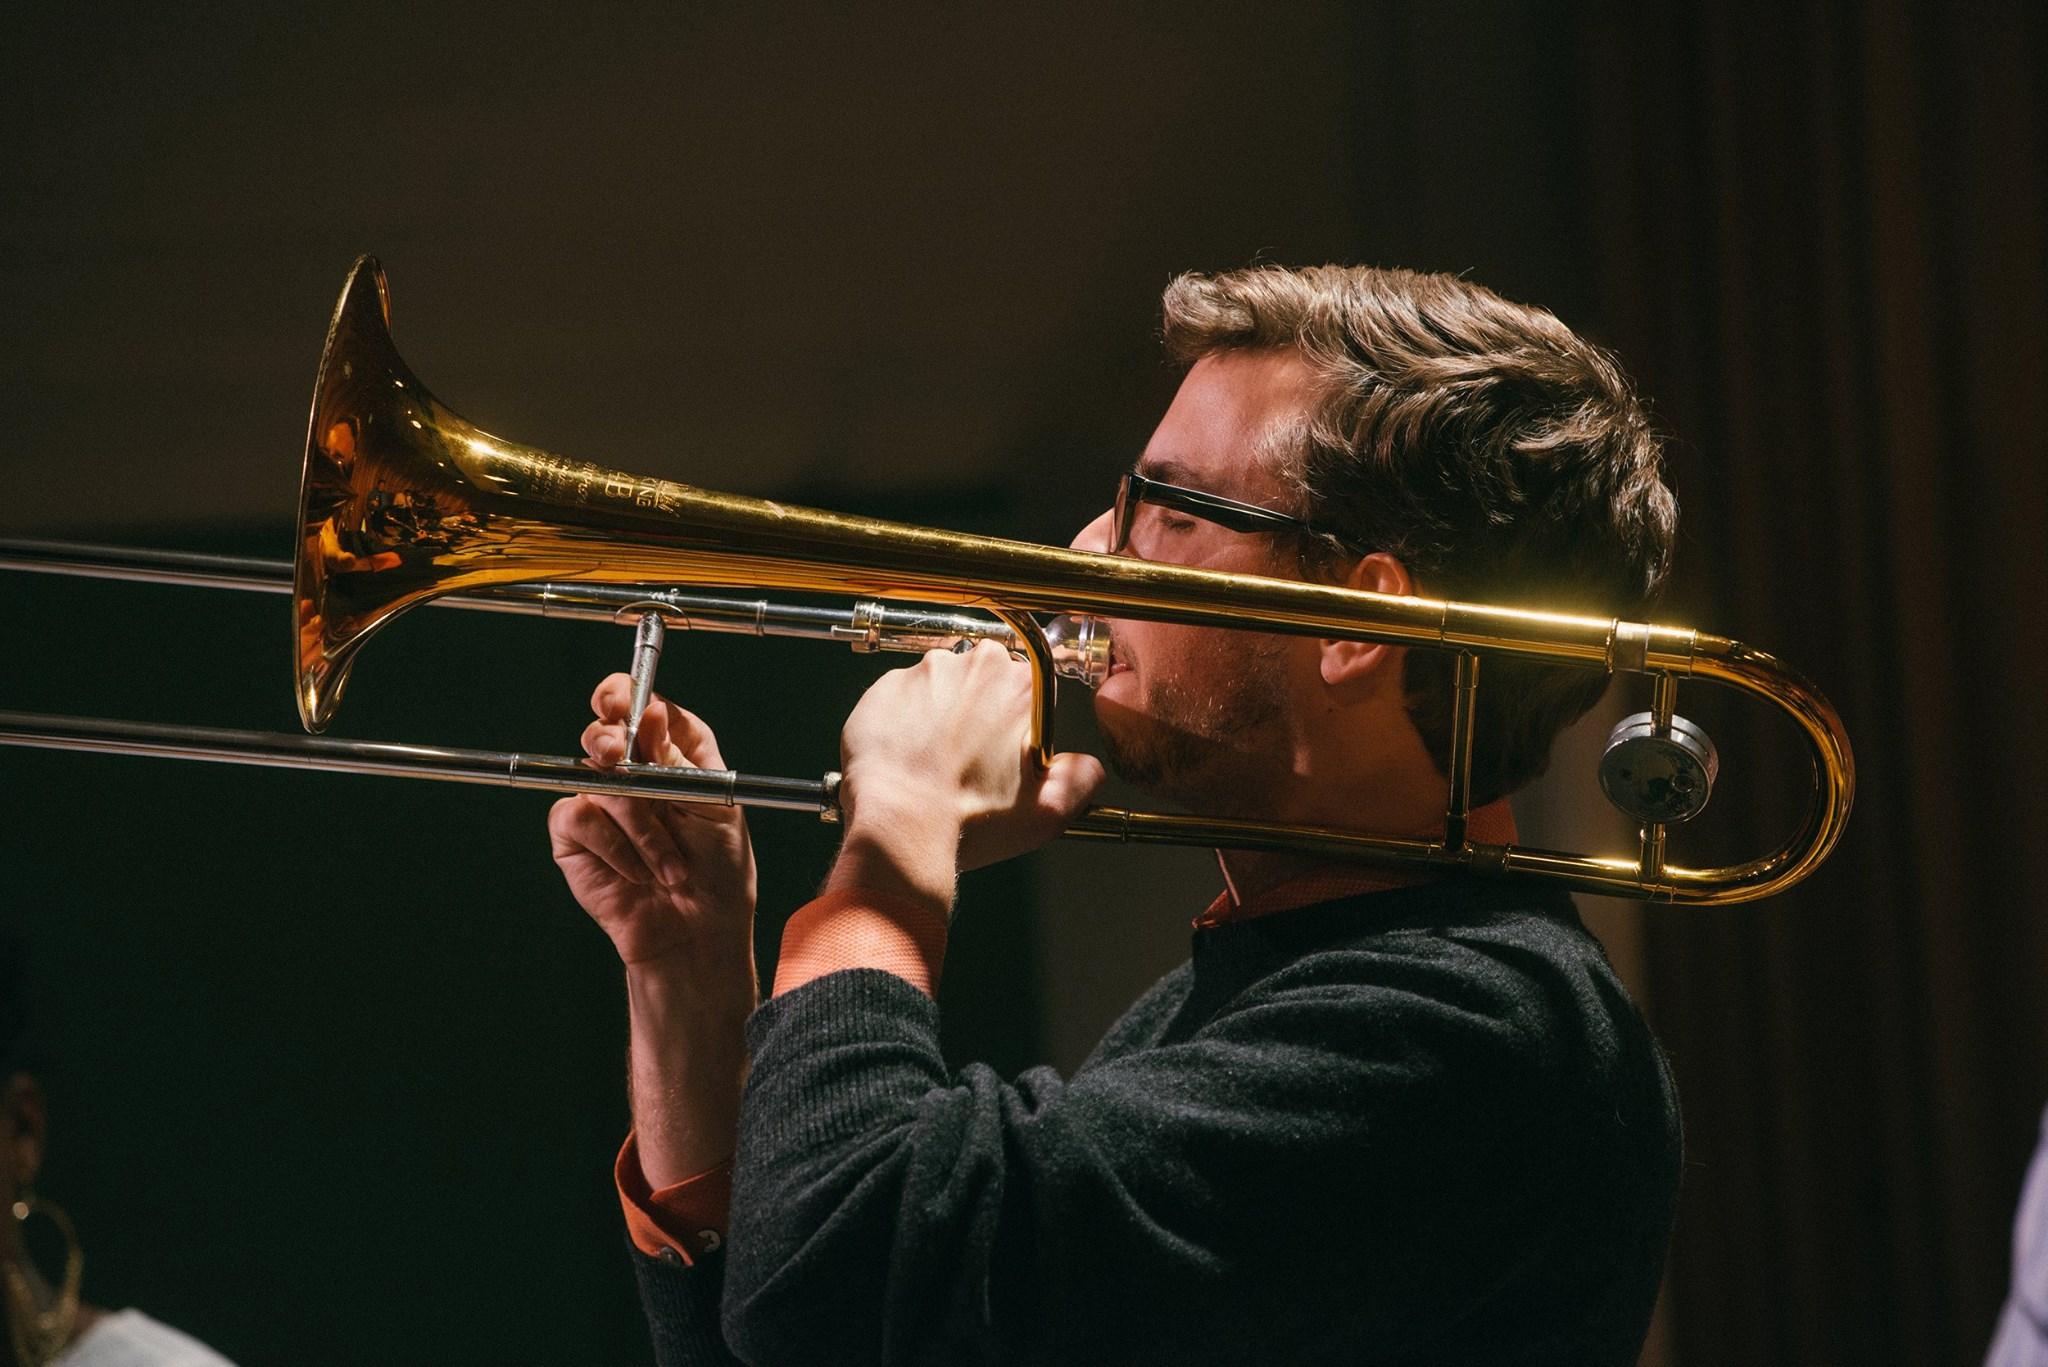 Trombonist, Producer & Arranger: Caleb Rumley